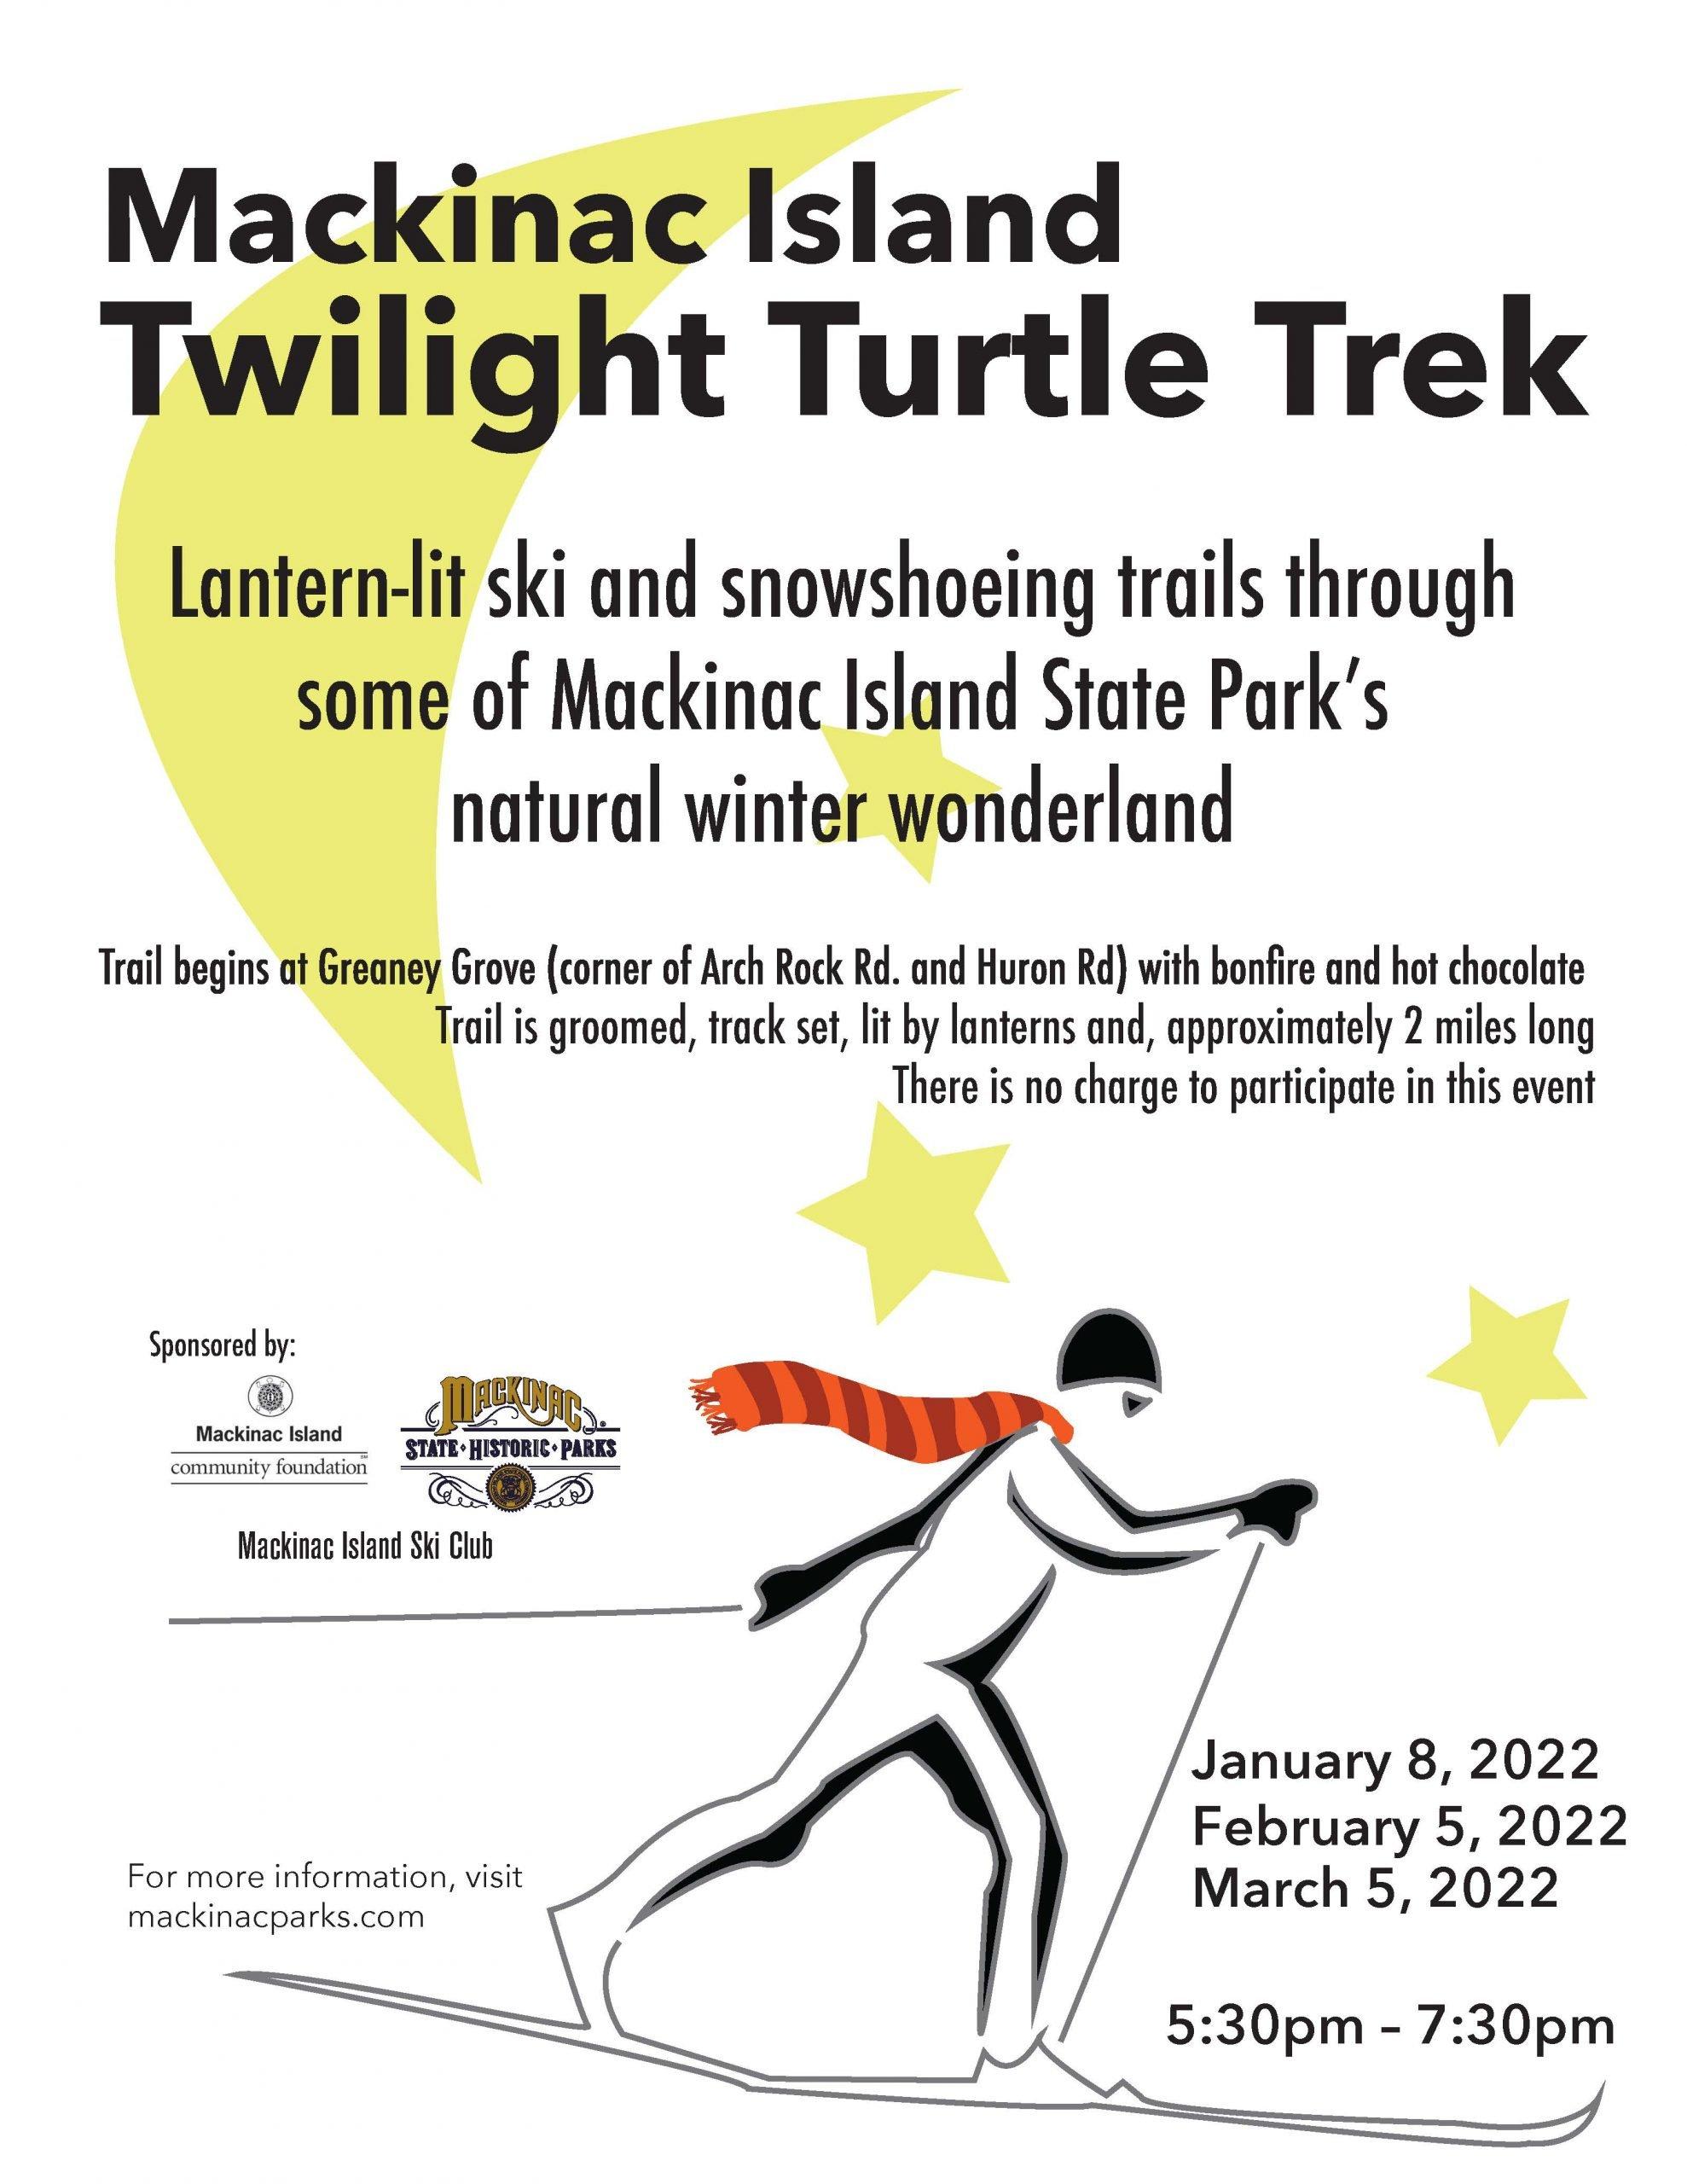 A poster highlighting the Twilight Turtle Trek on Mackinac Island.